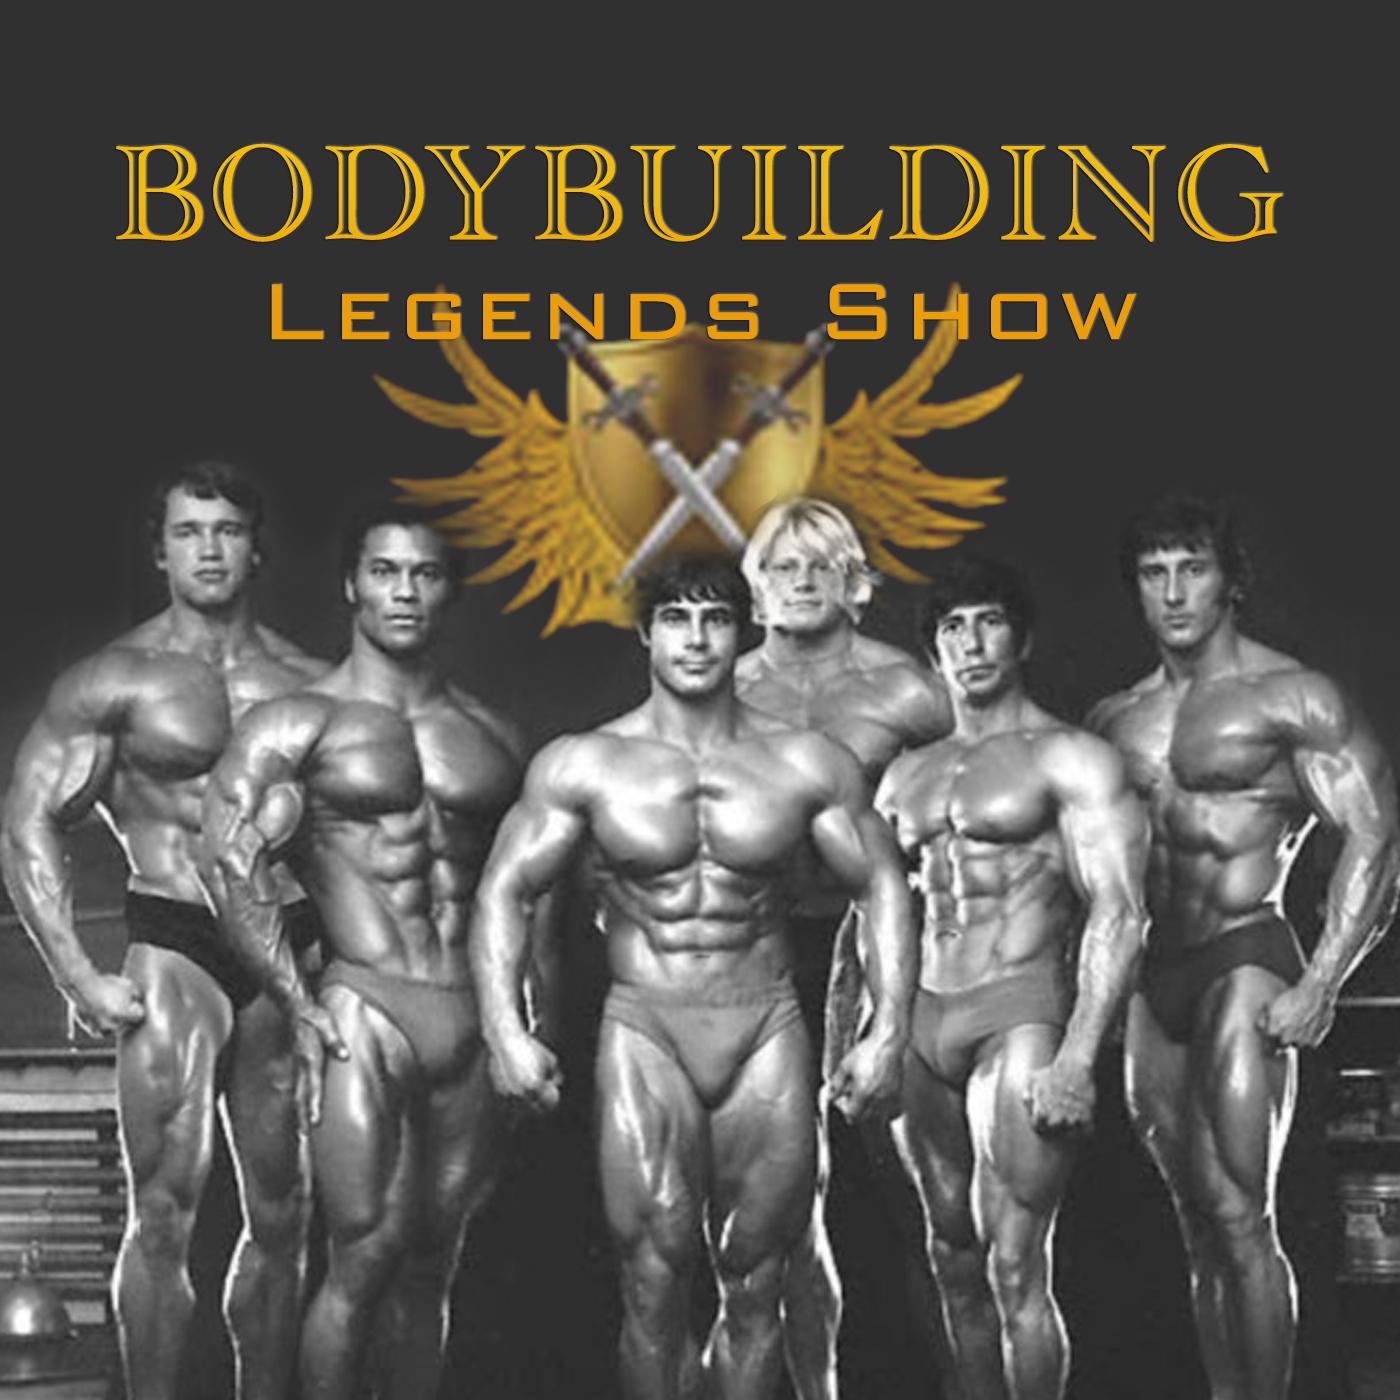 Bodybuilding Legends Show